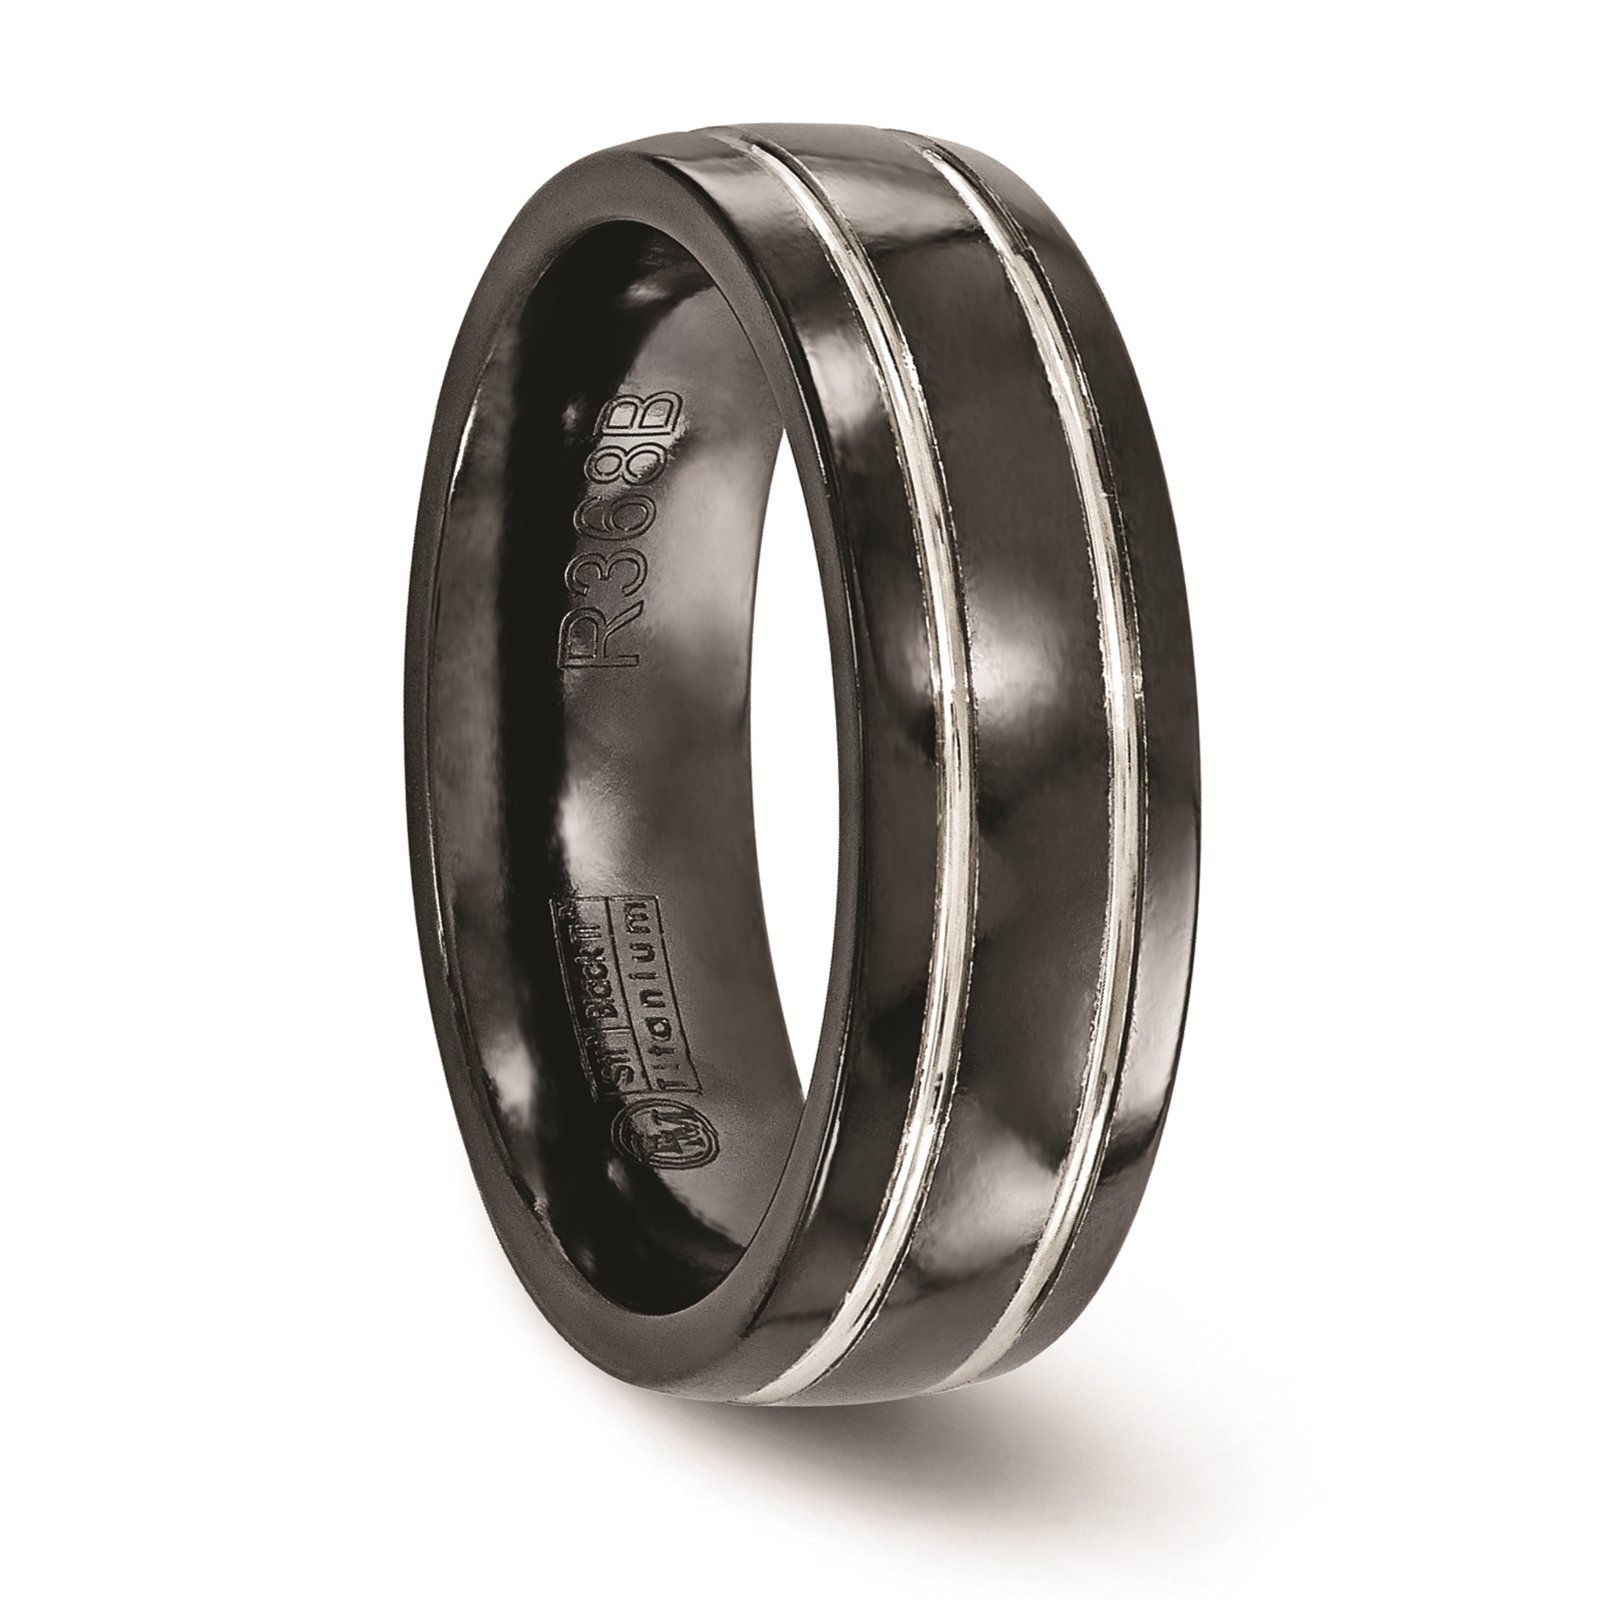 Titanium Black Ti & Grey Grooved 7mm Wedding Ring Band Size 8.5 by Edward Mirell by Venture Edward Mirell Titanium Bands (Image #4)